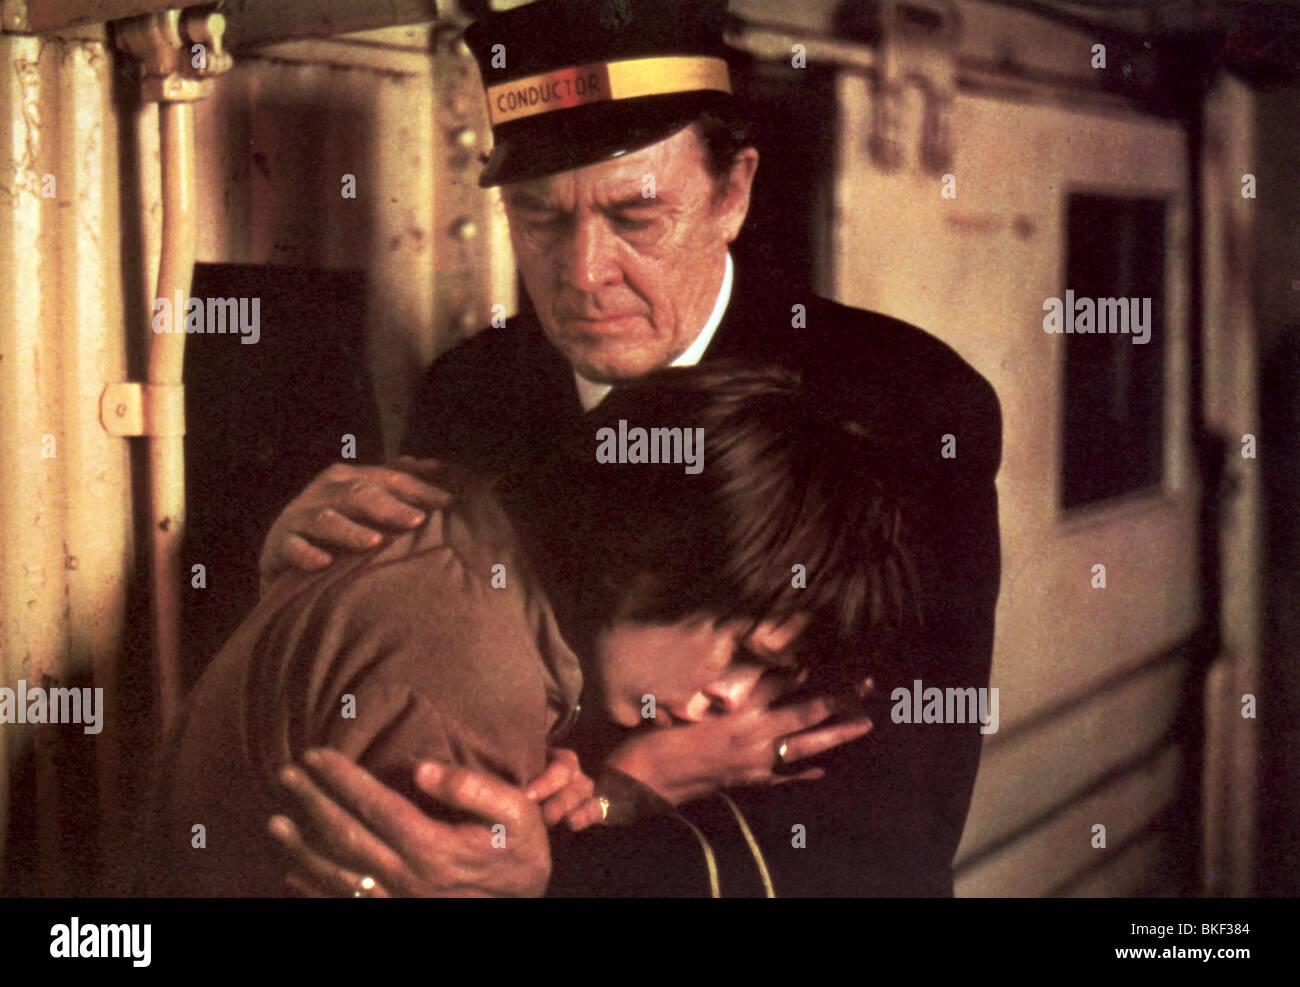 terror train 1980 jamie lee curtis ttrn 007foh stock photo